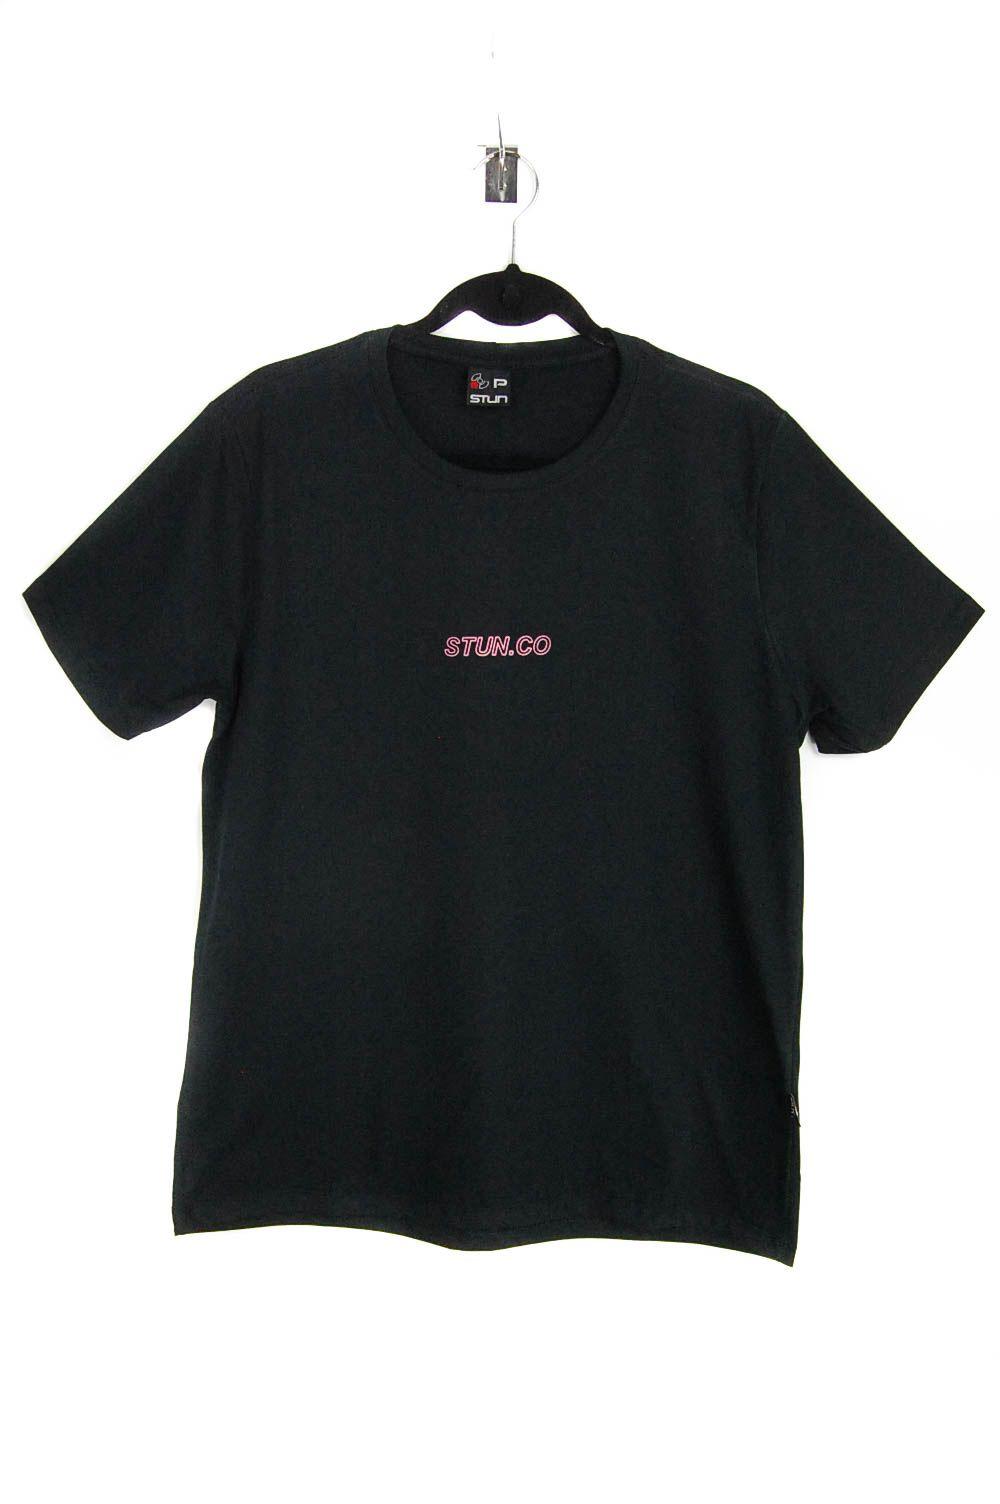 Camiseta Básica .Co Stun